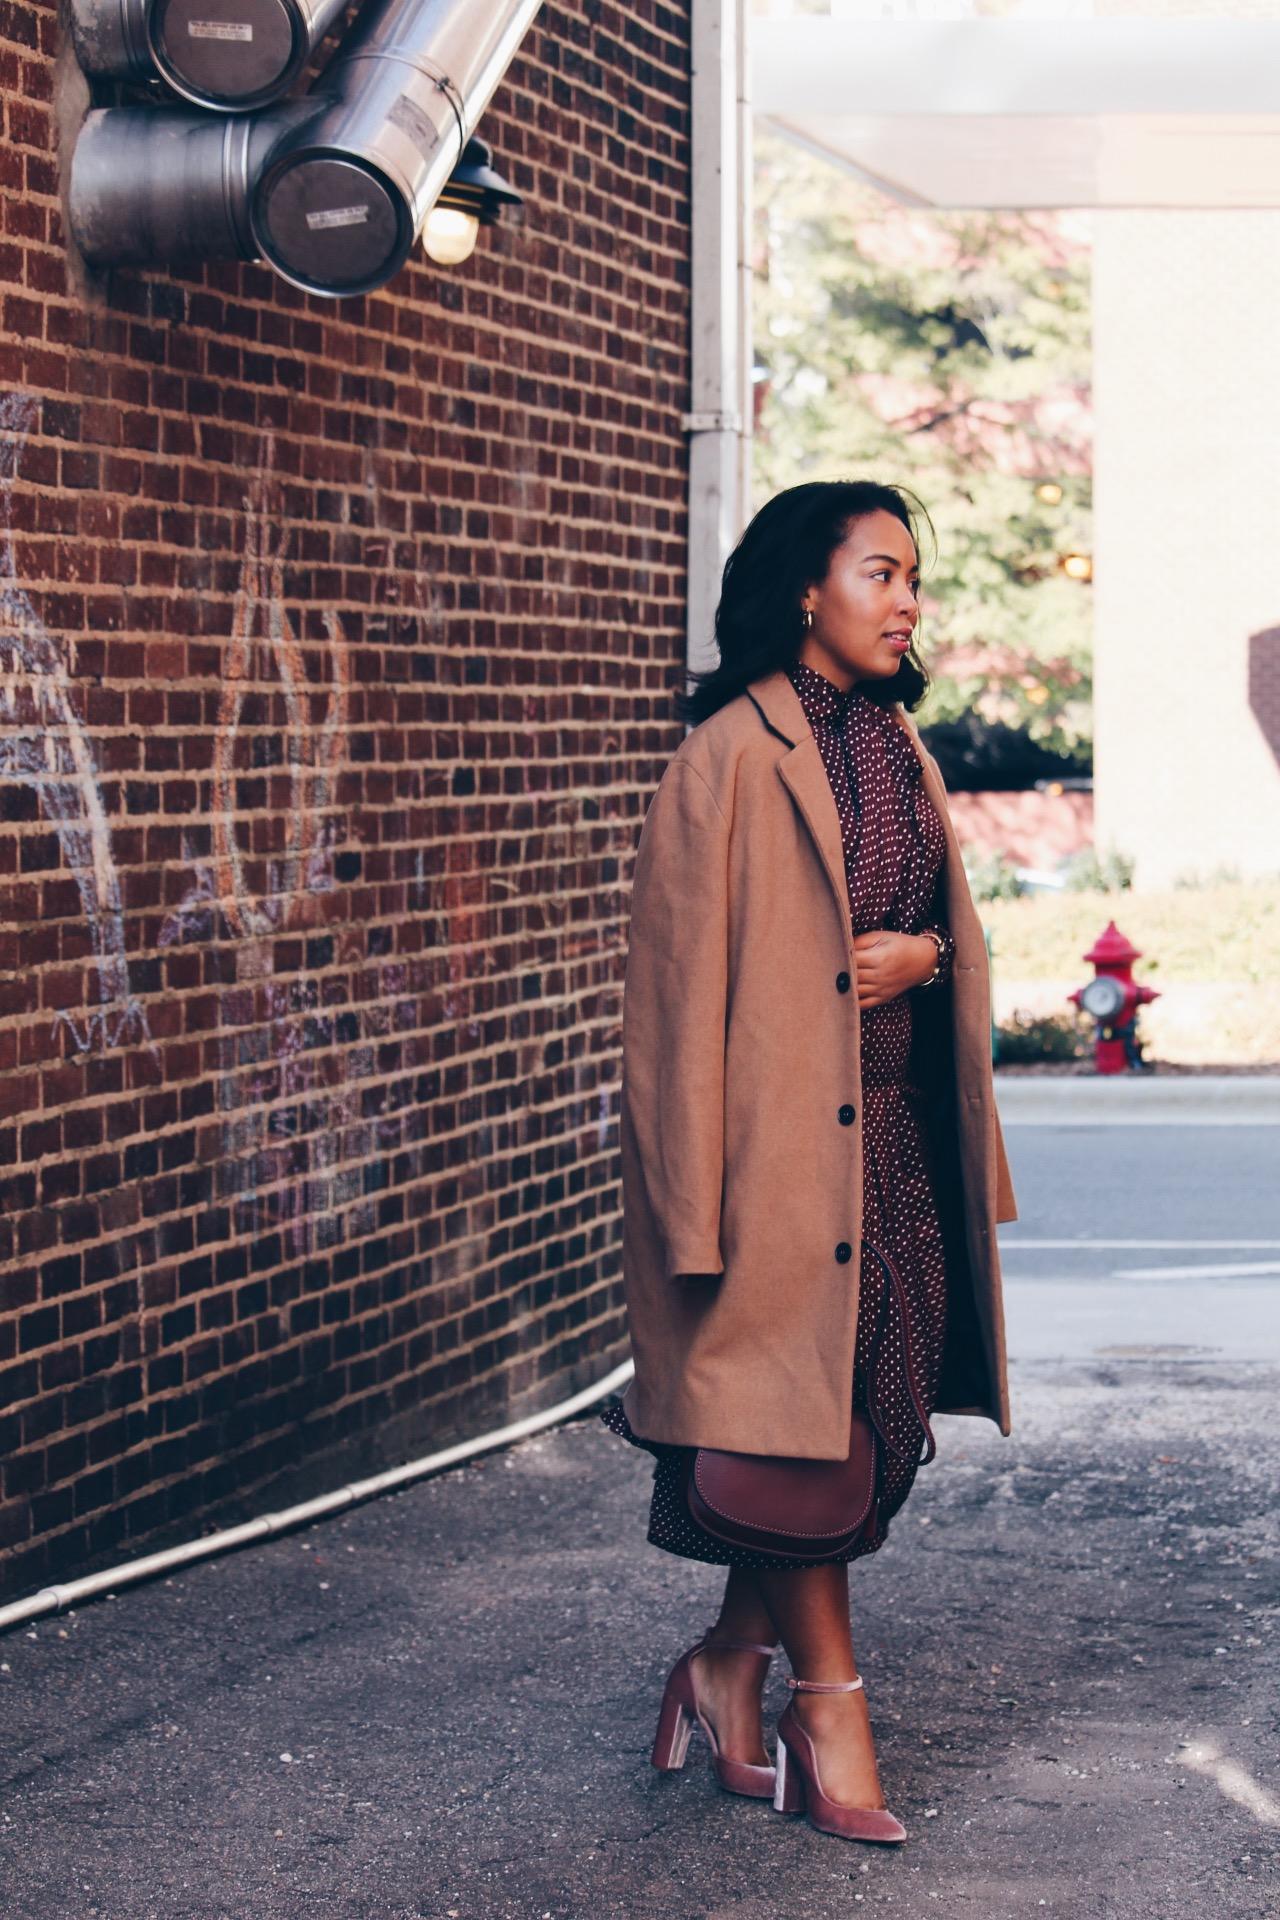 Zara-polka-dot-blouse-and-skirt-urban-outfitters-camel-coat-coach-saddle-bag-topshop-gracie-velvet-heels-similar-aquazurra-alix-pumps-womens-workwear-fashion-11.JPG